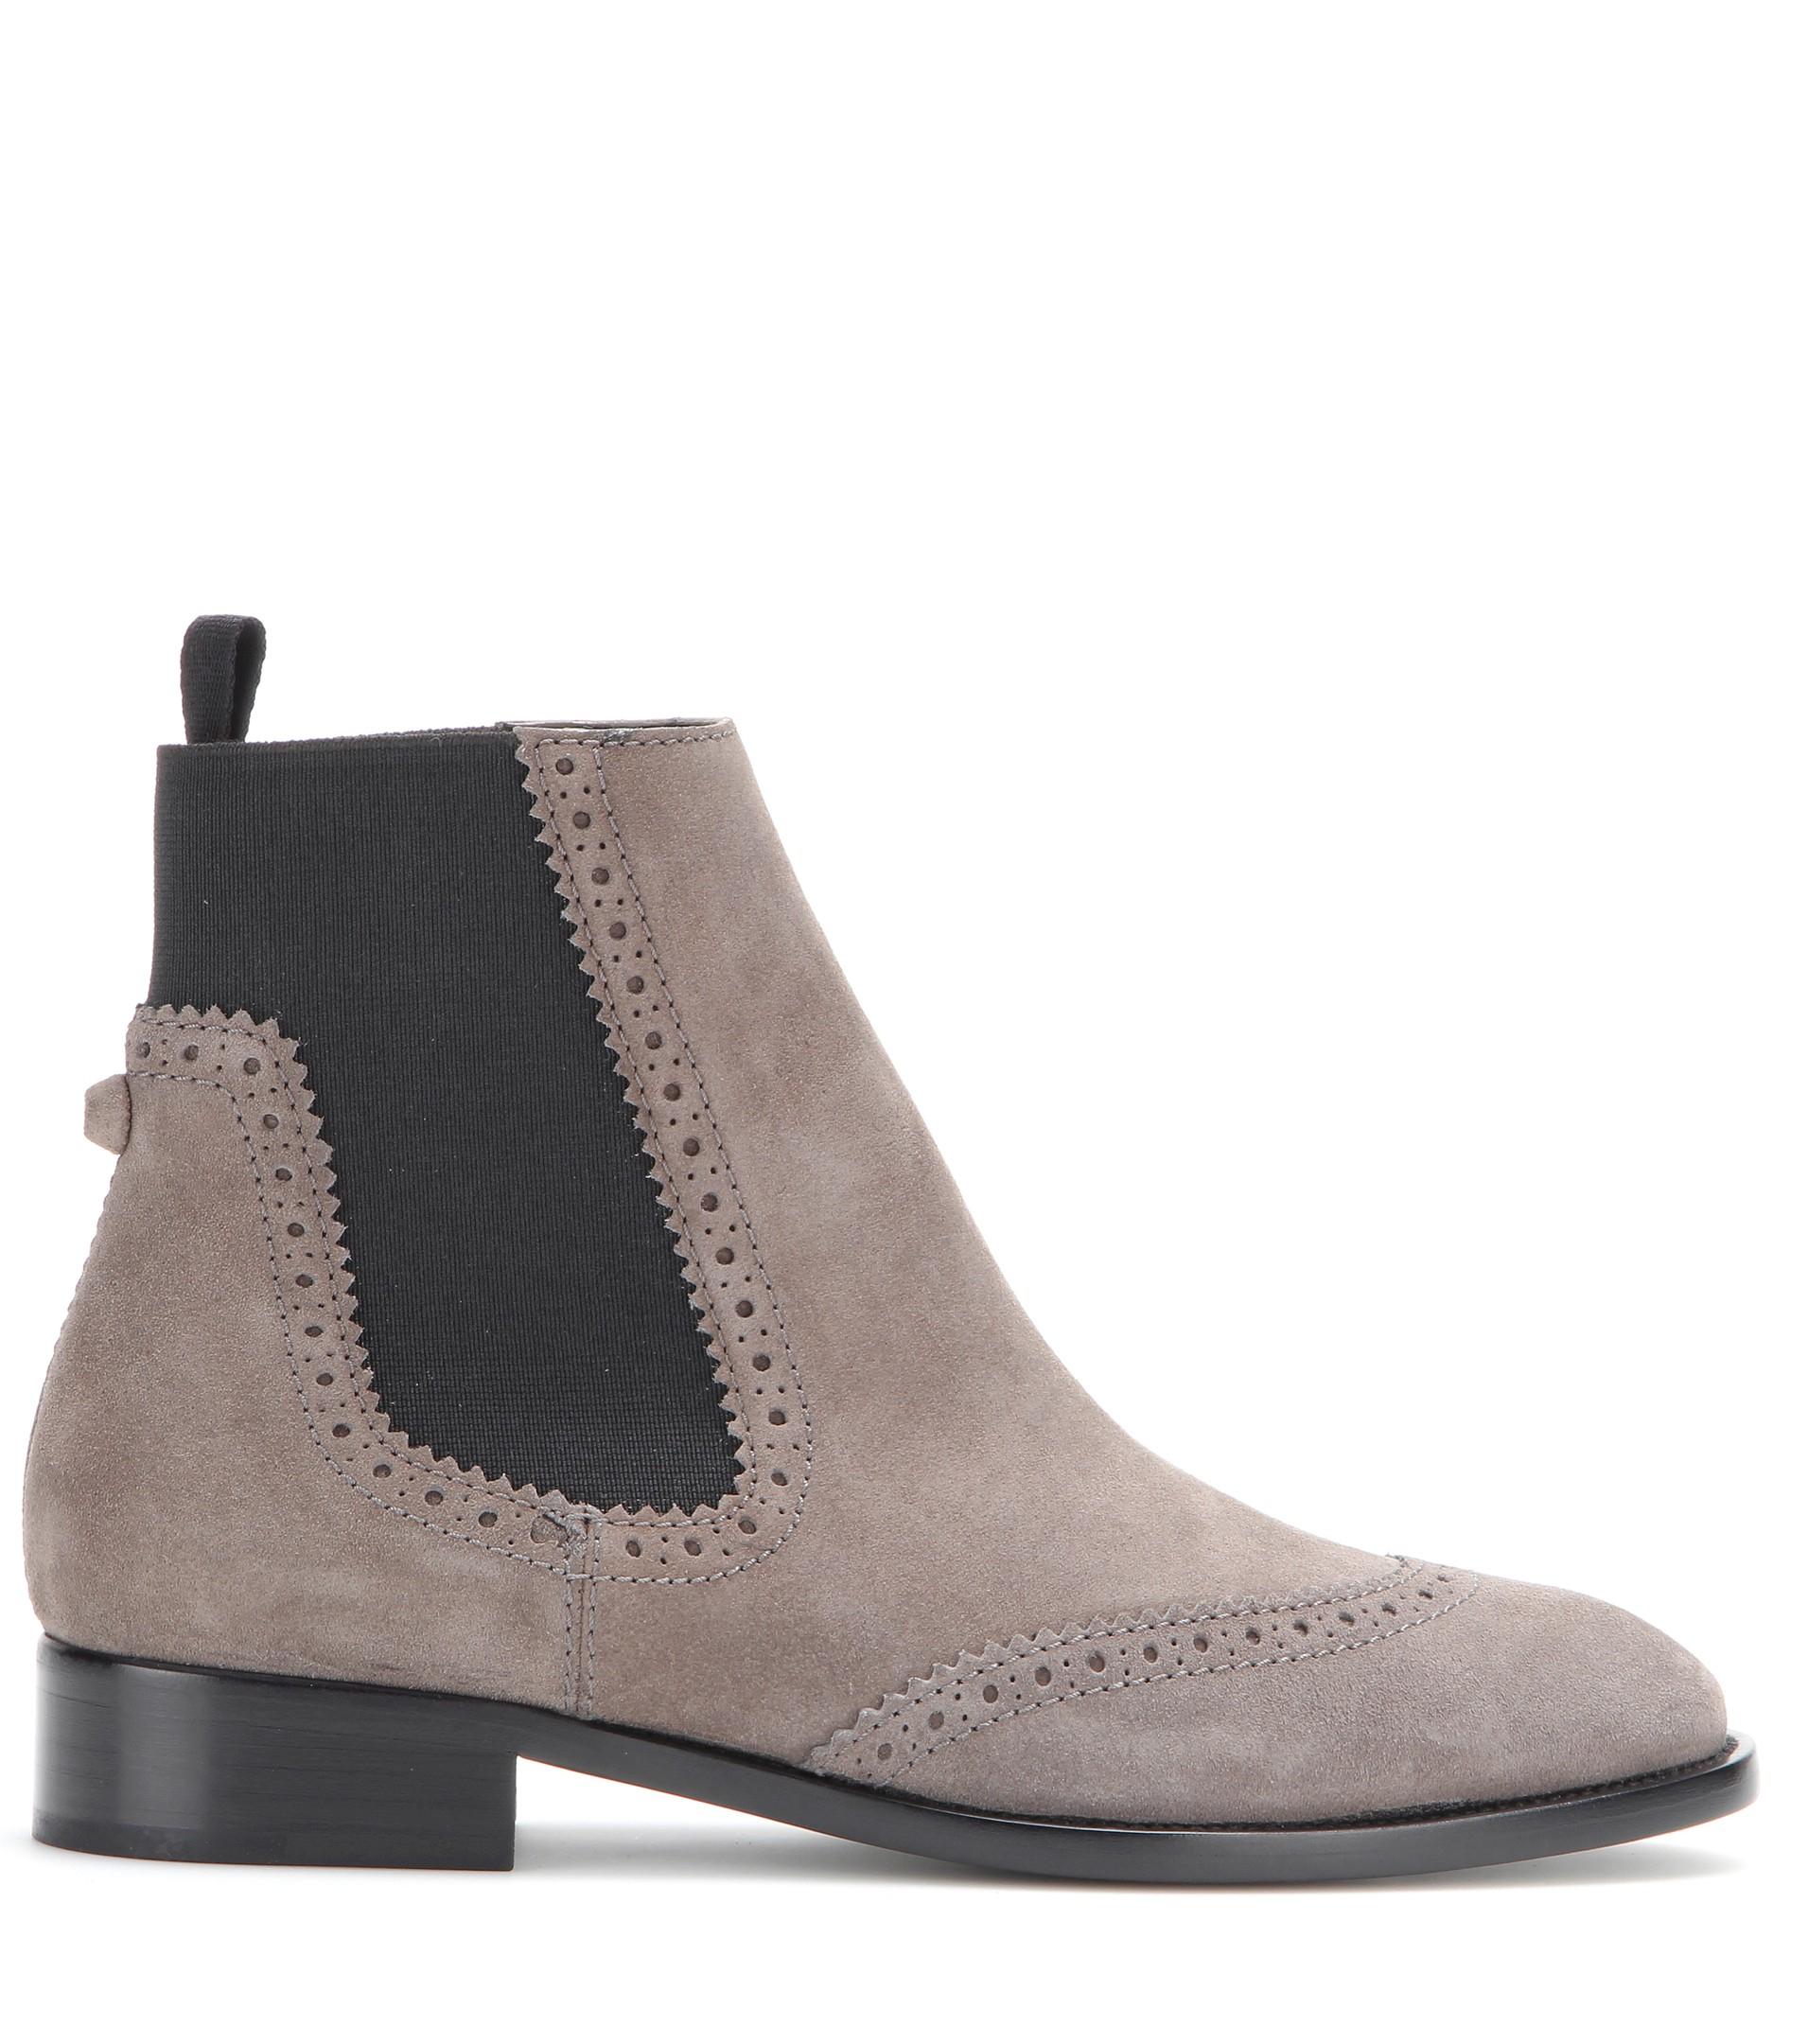 Lyst - Balenciaga Suede Chelsea Boots in Black